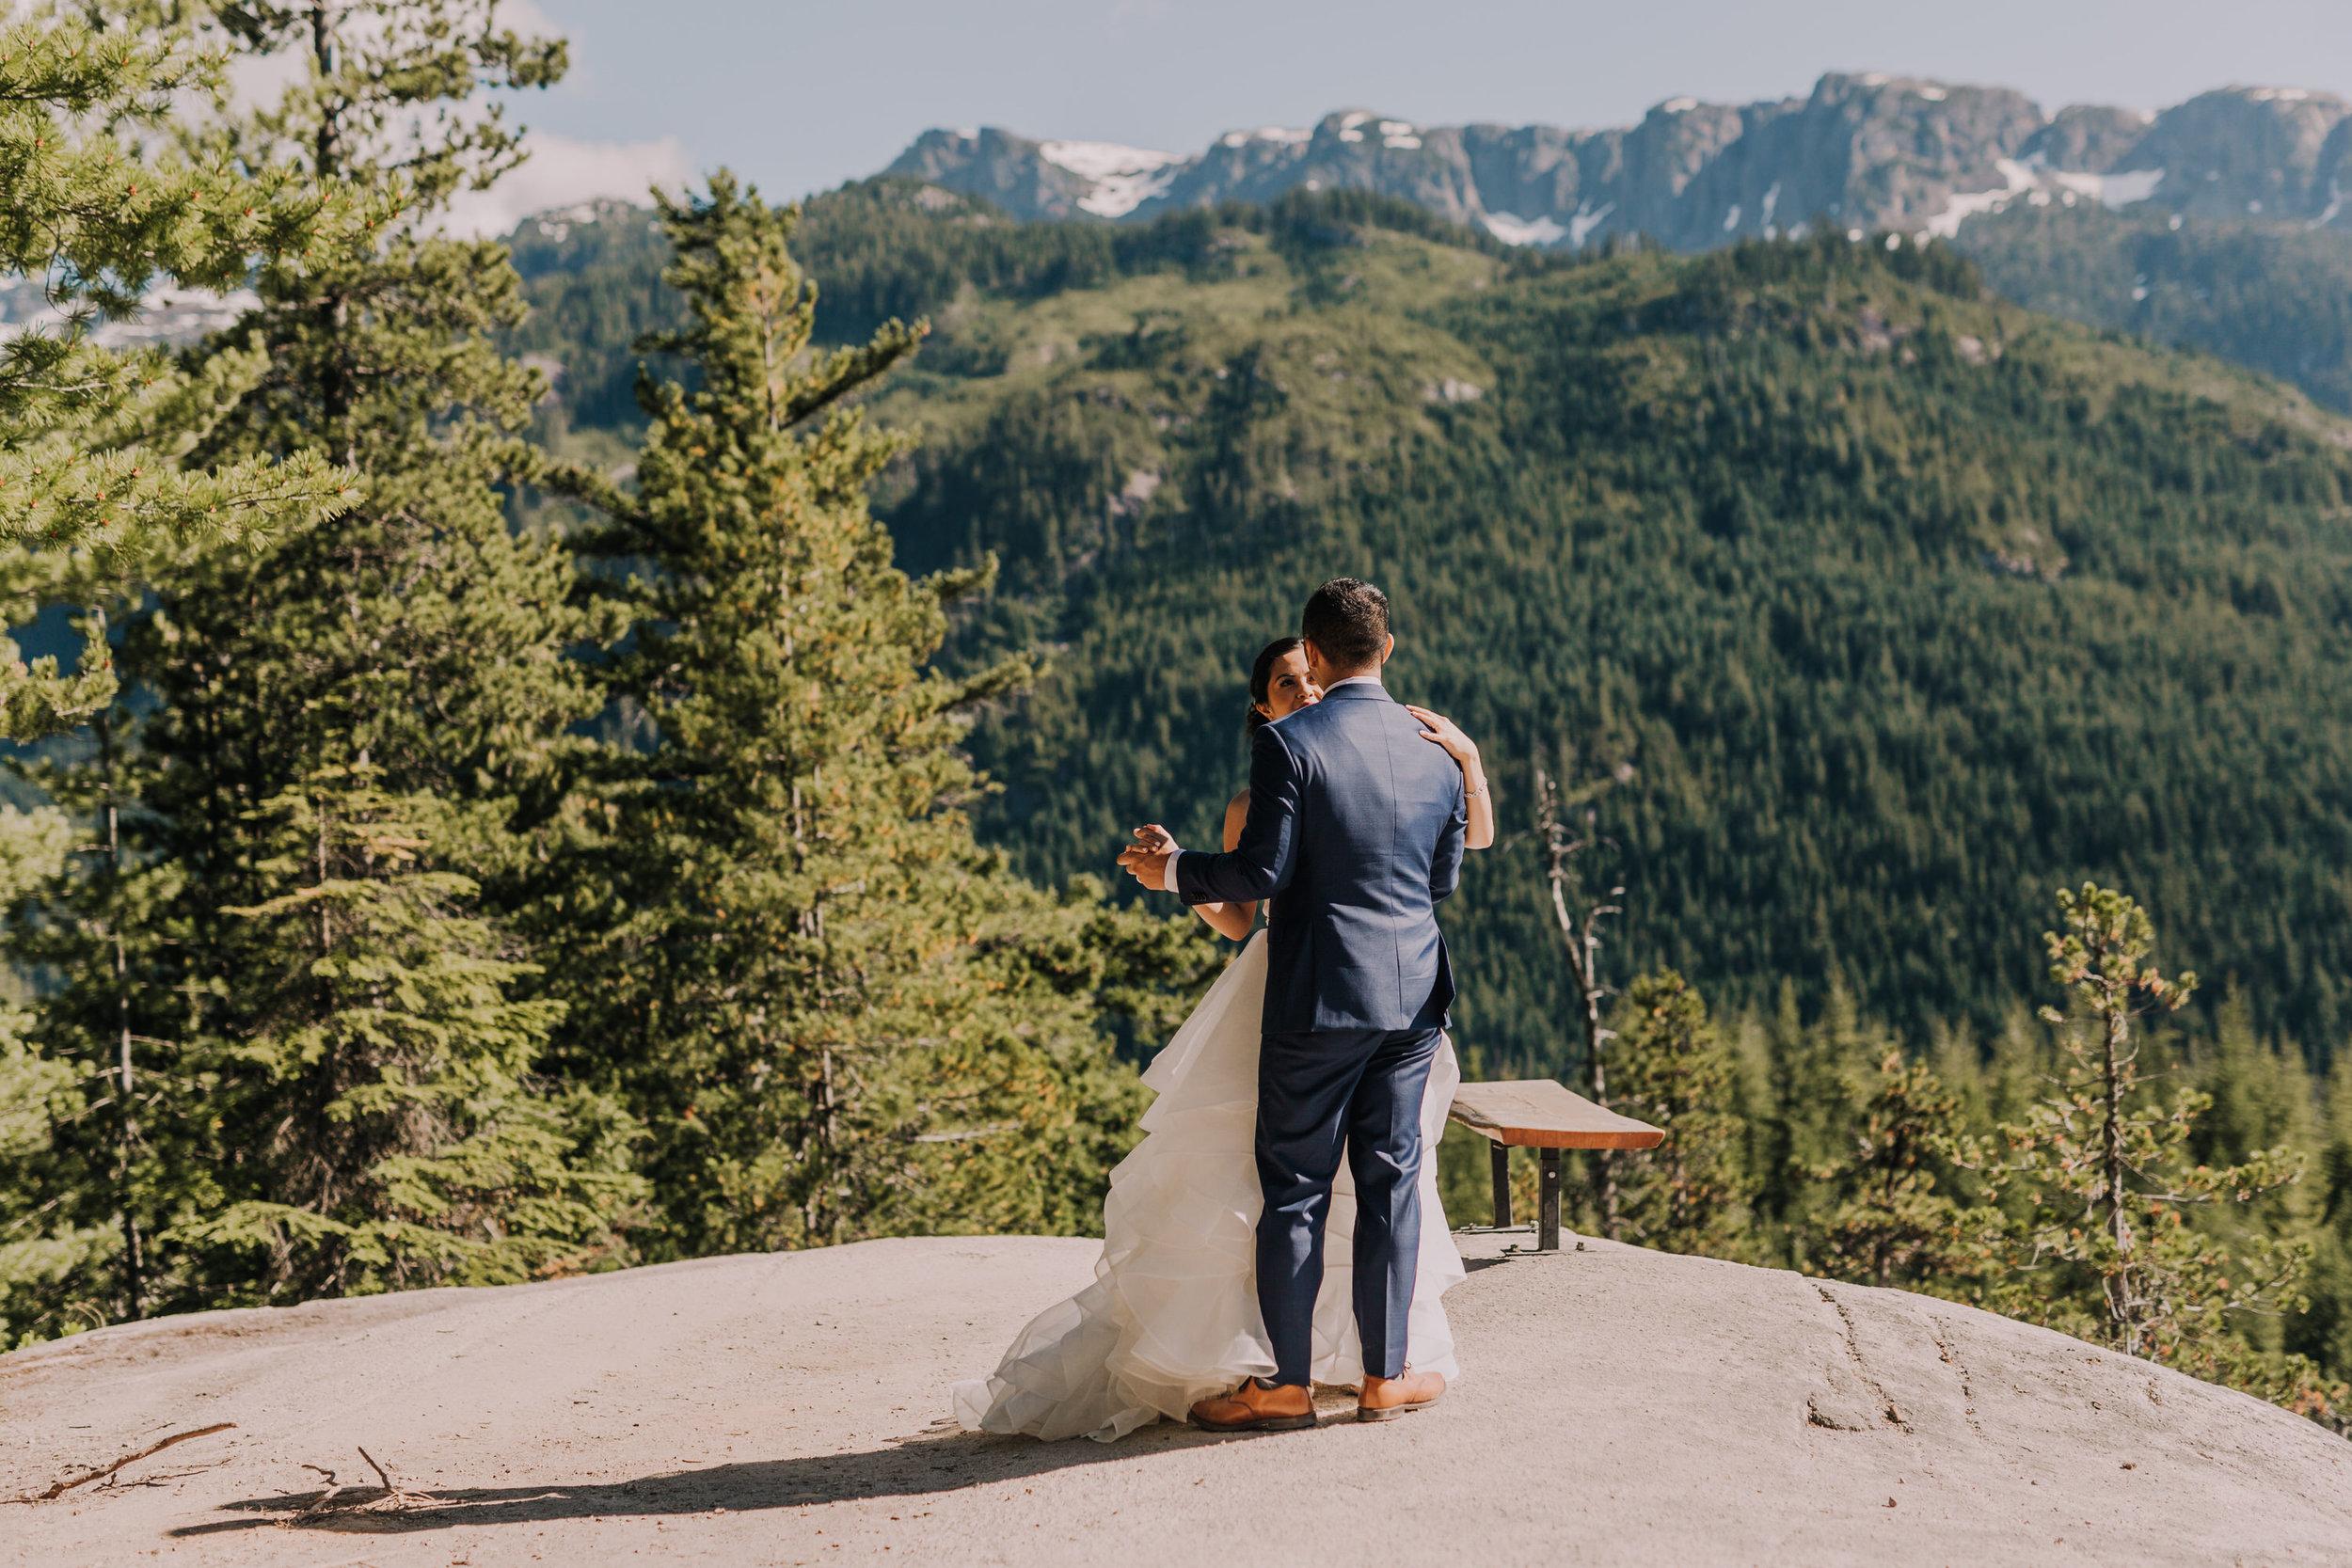 Squamish Wedding Photographer - Sea to Sky Gondola Wedding Photos -  Vancouver Wedding Photographer & Videographer - Sunshine Coast Wedding Photos - Sunshine Coast Wedding Photographer - Jennifer Picard Photography - IMG_3533_1.jpg